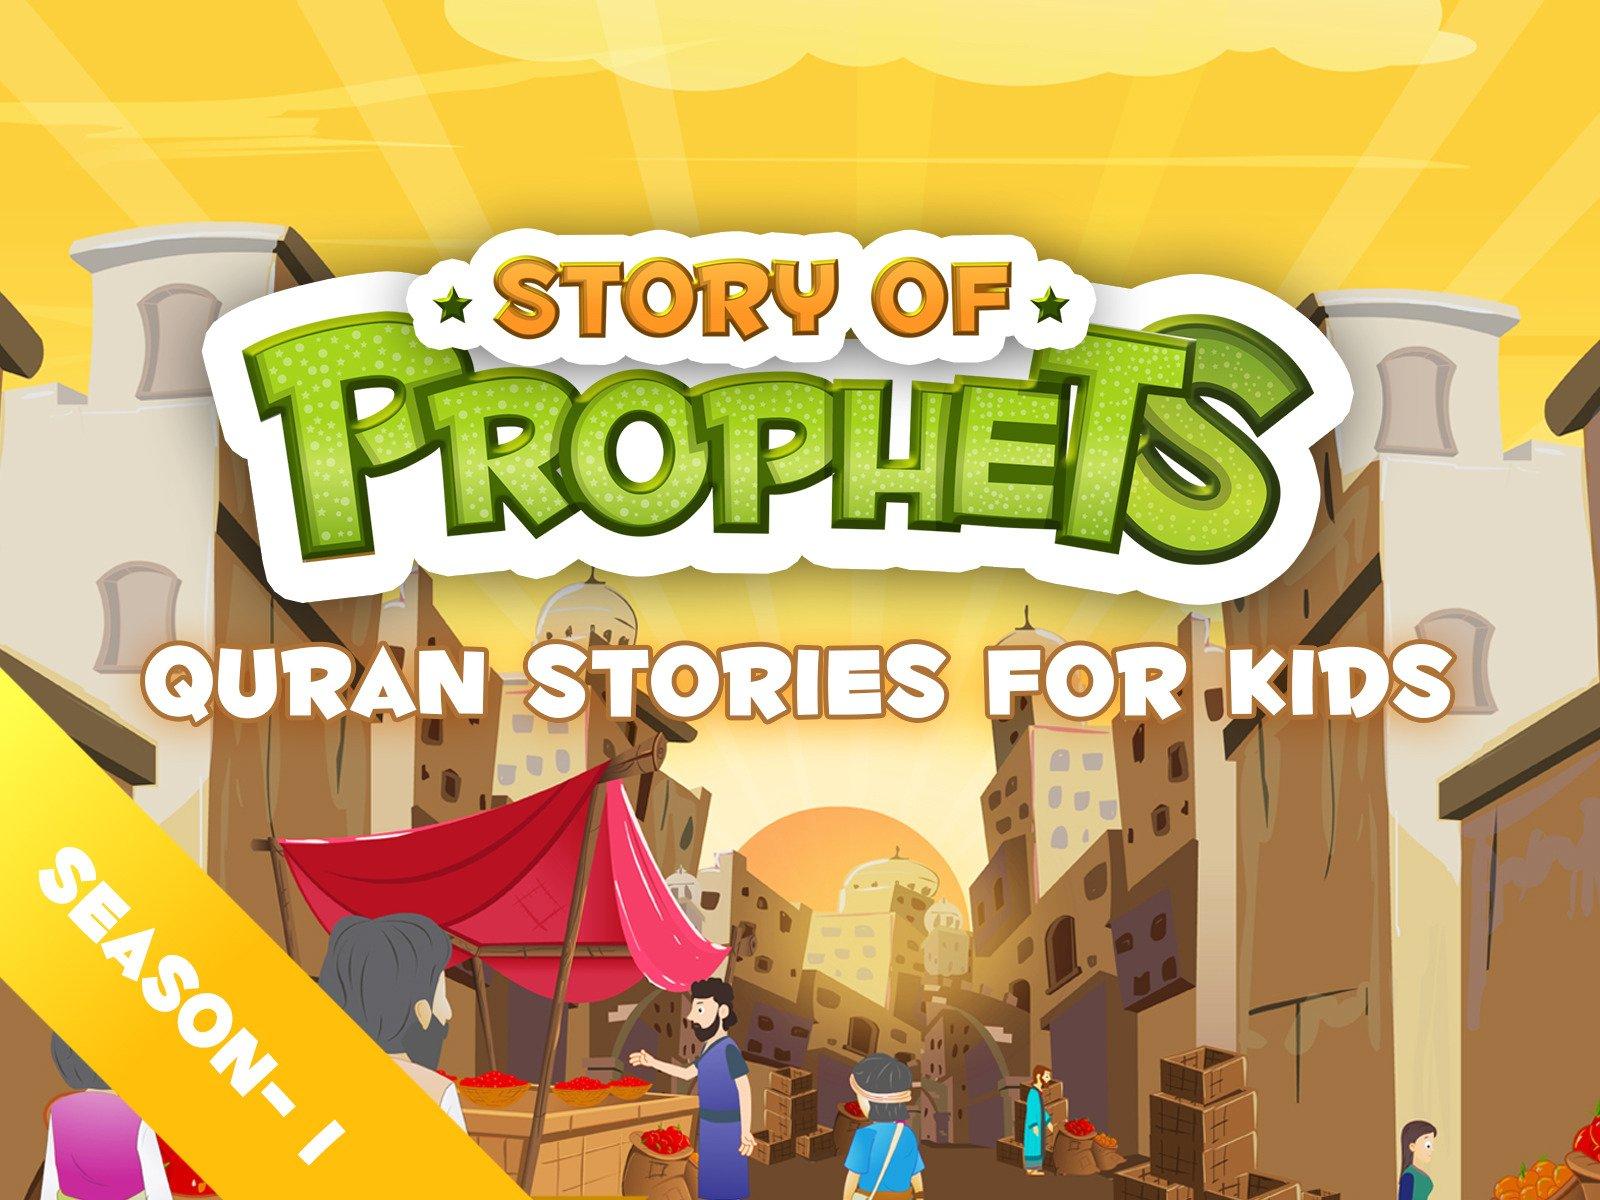 Quran Stories for Kids - Season 1